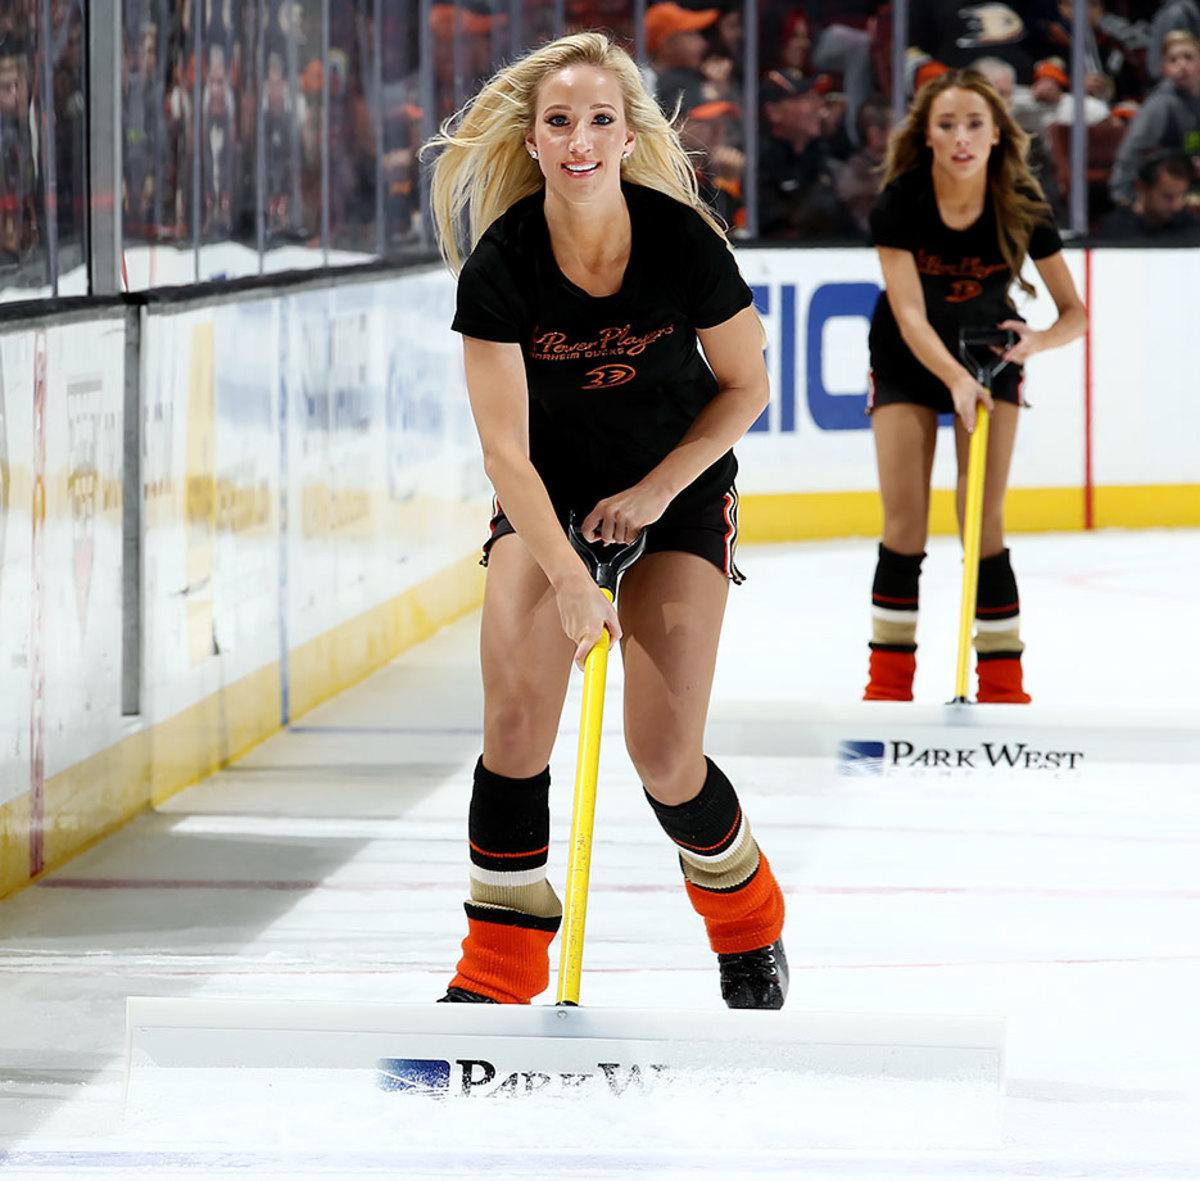 Anaheim-Ducks-Power-Players-Ice-Girls-GettyImages-502694876_master.jpg